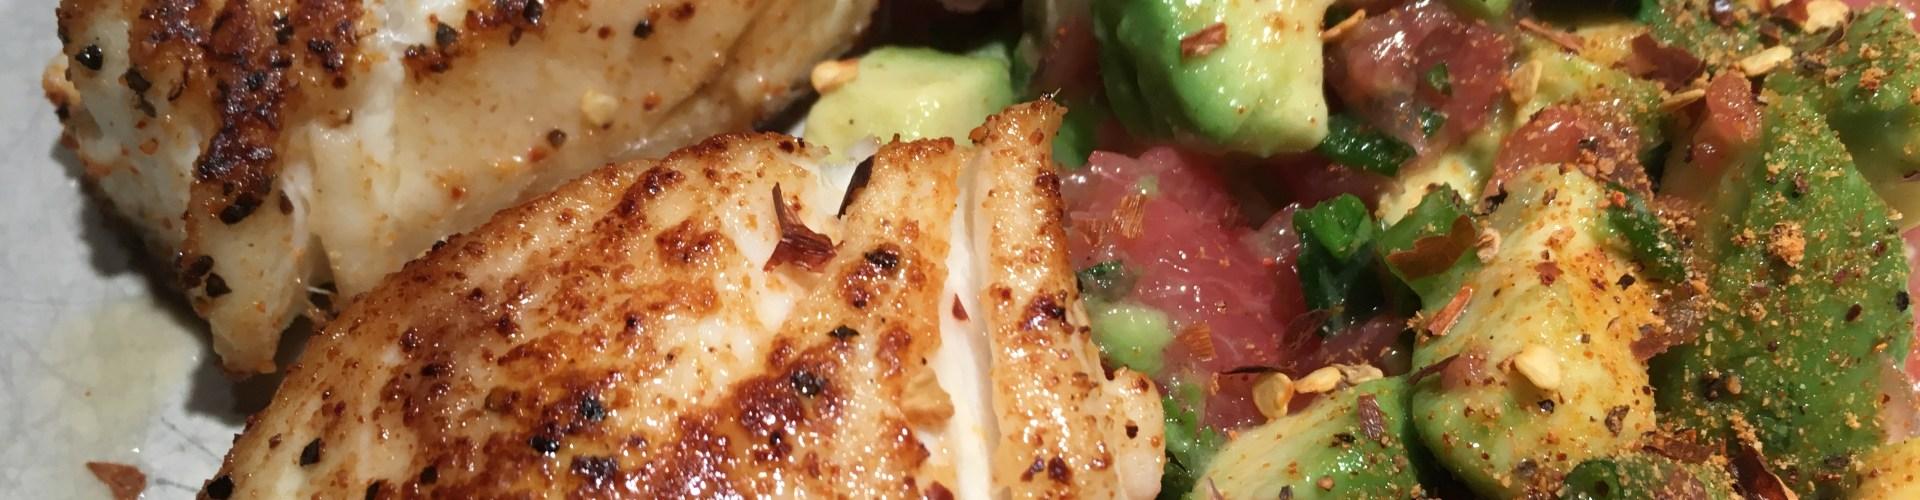 Pan-seared halibut with grapefruit avocado salsa